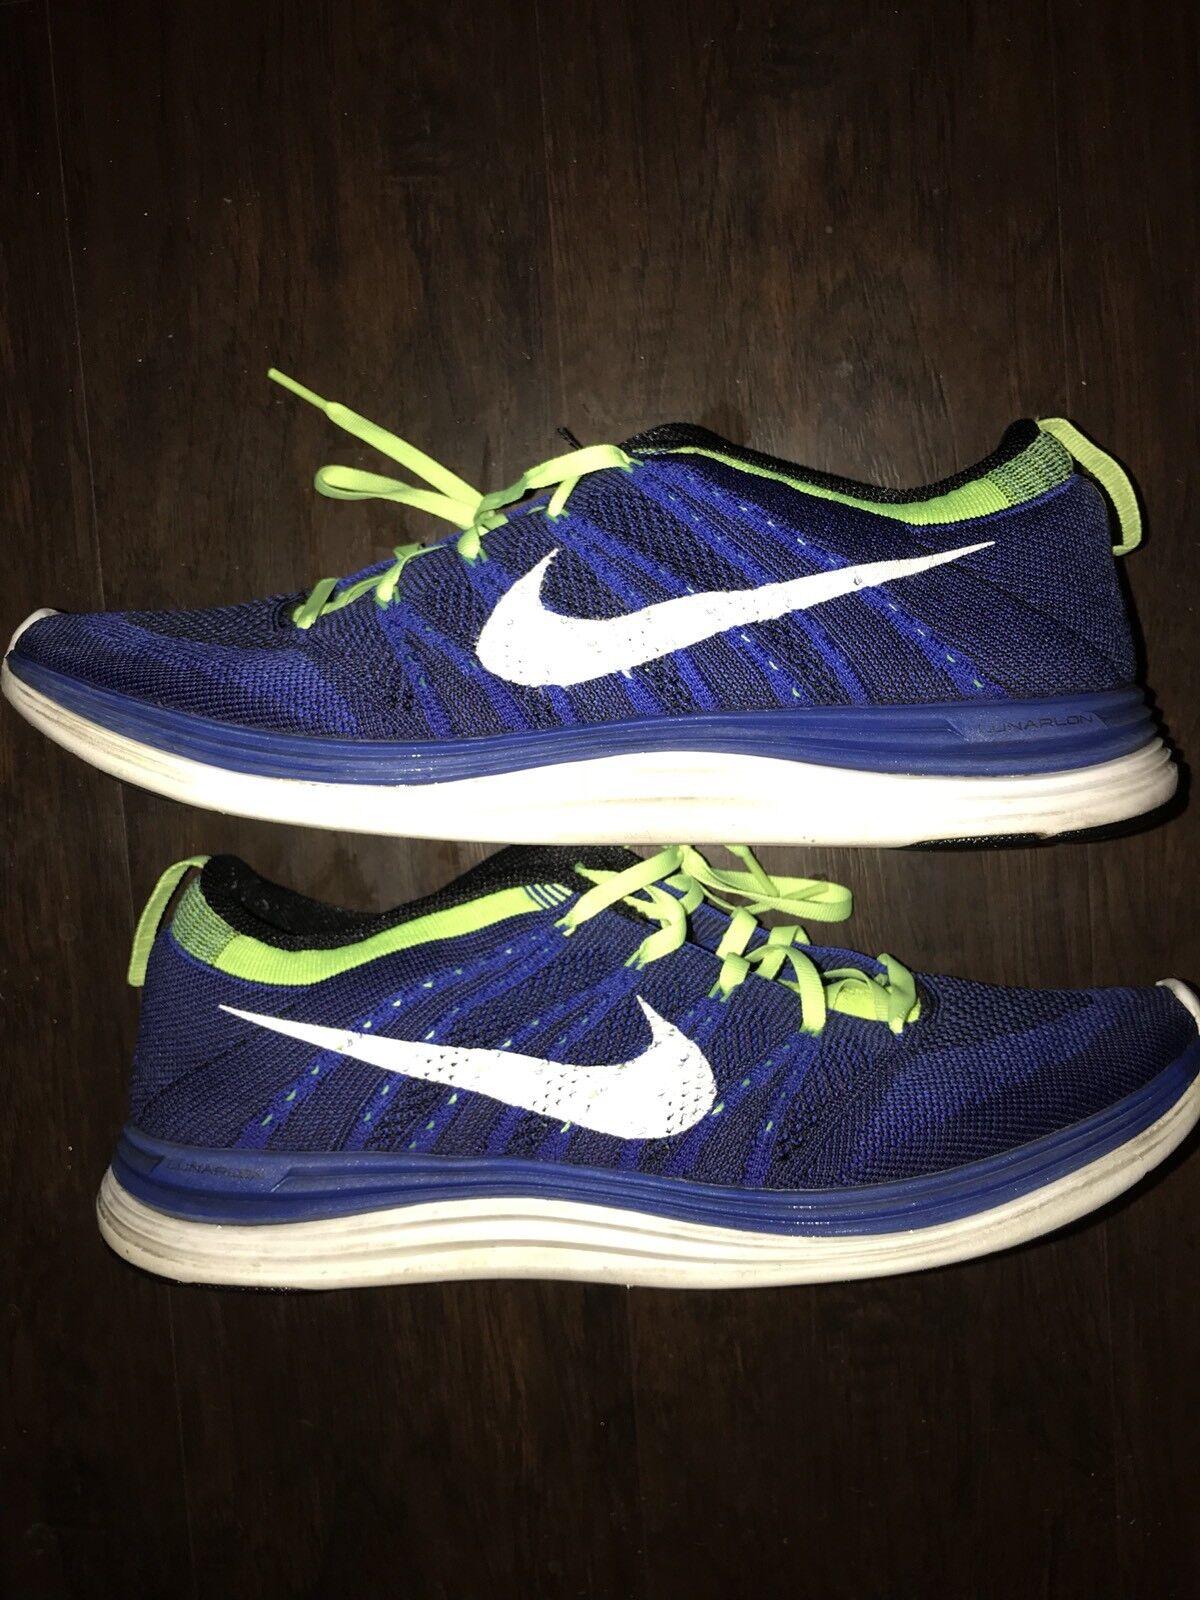 buy online 50e60 6d911 nike nike nike flyknit lunar one match royal volt sz 11 des chaussures d  hommes ...